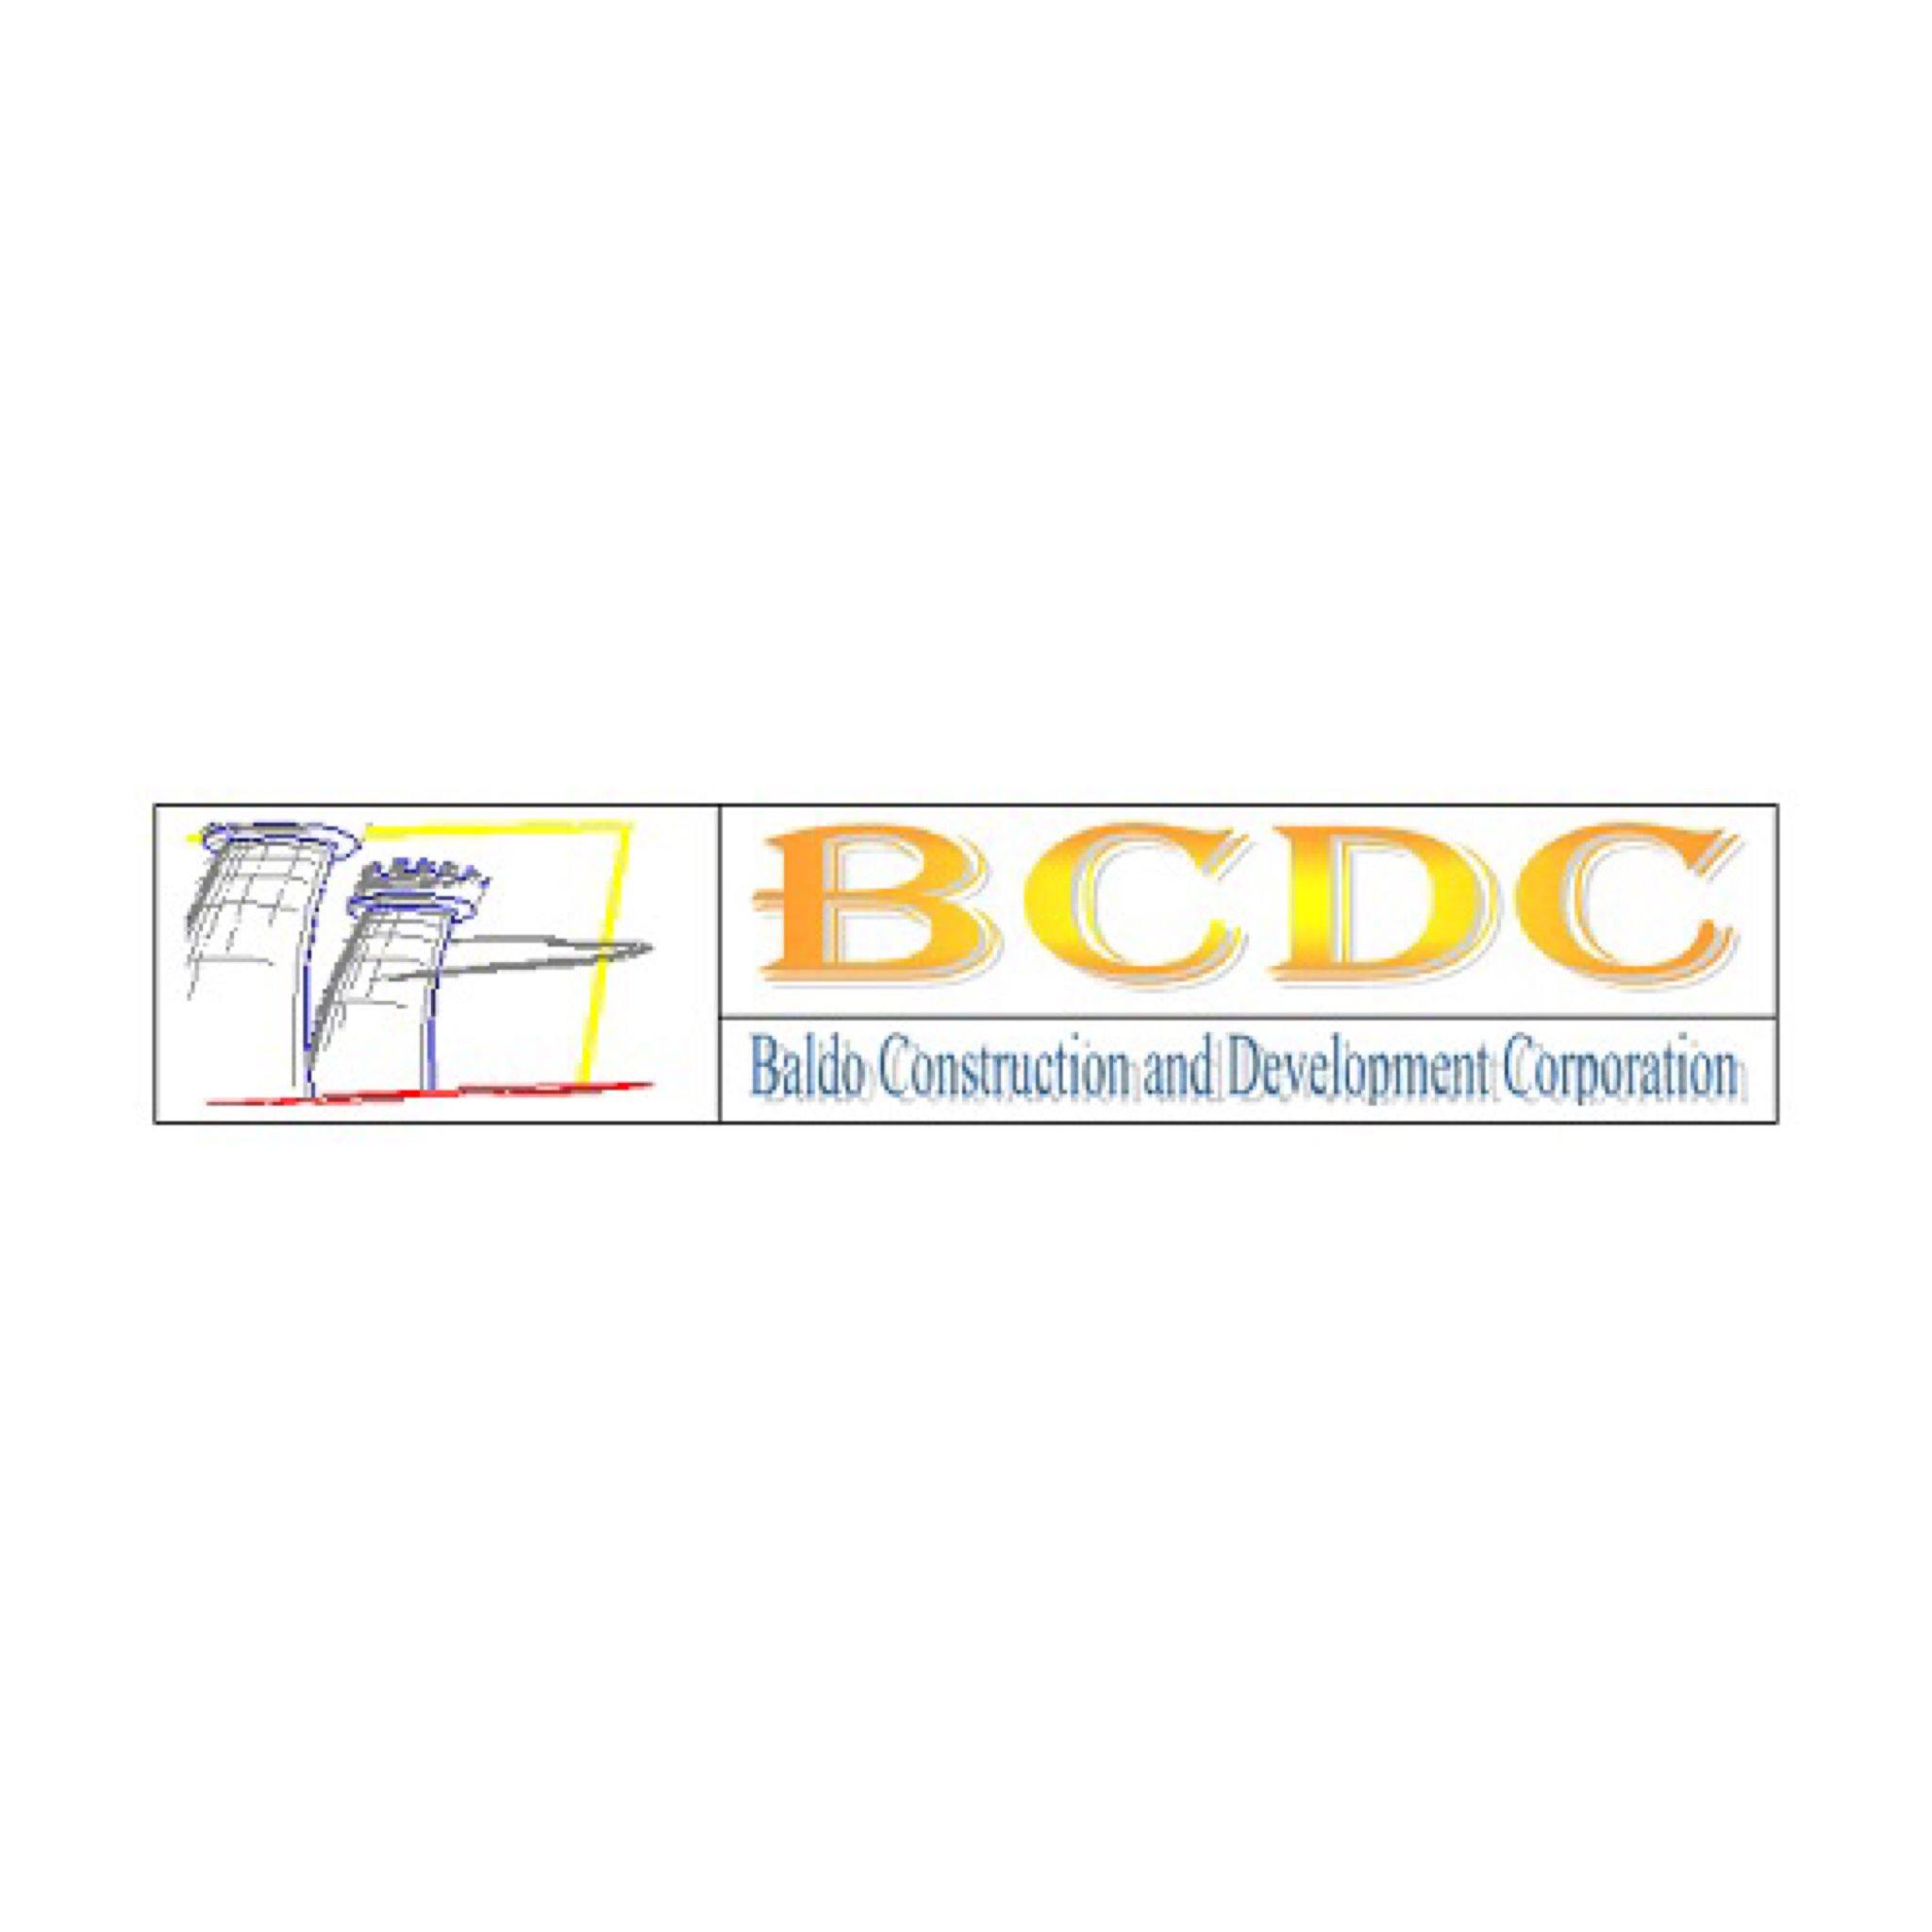 Baldo Construction and Development Corporation